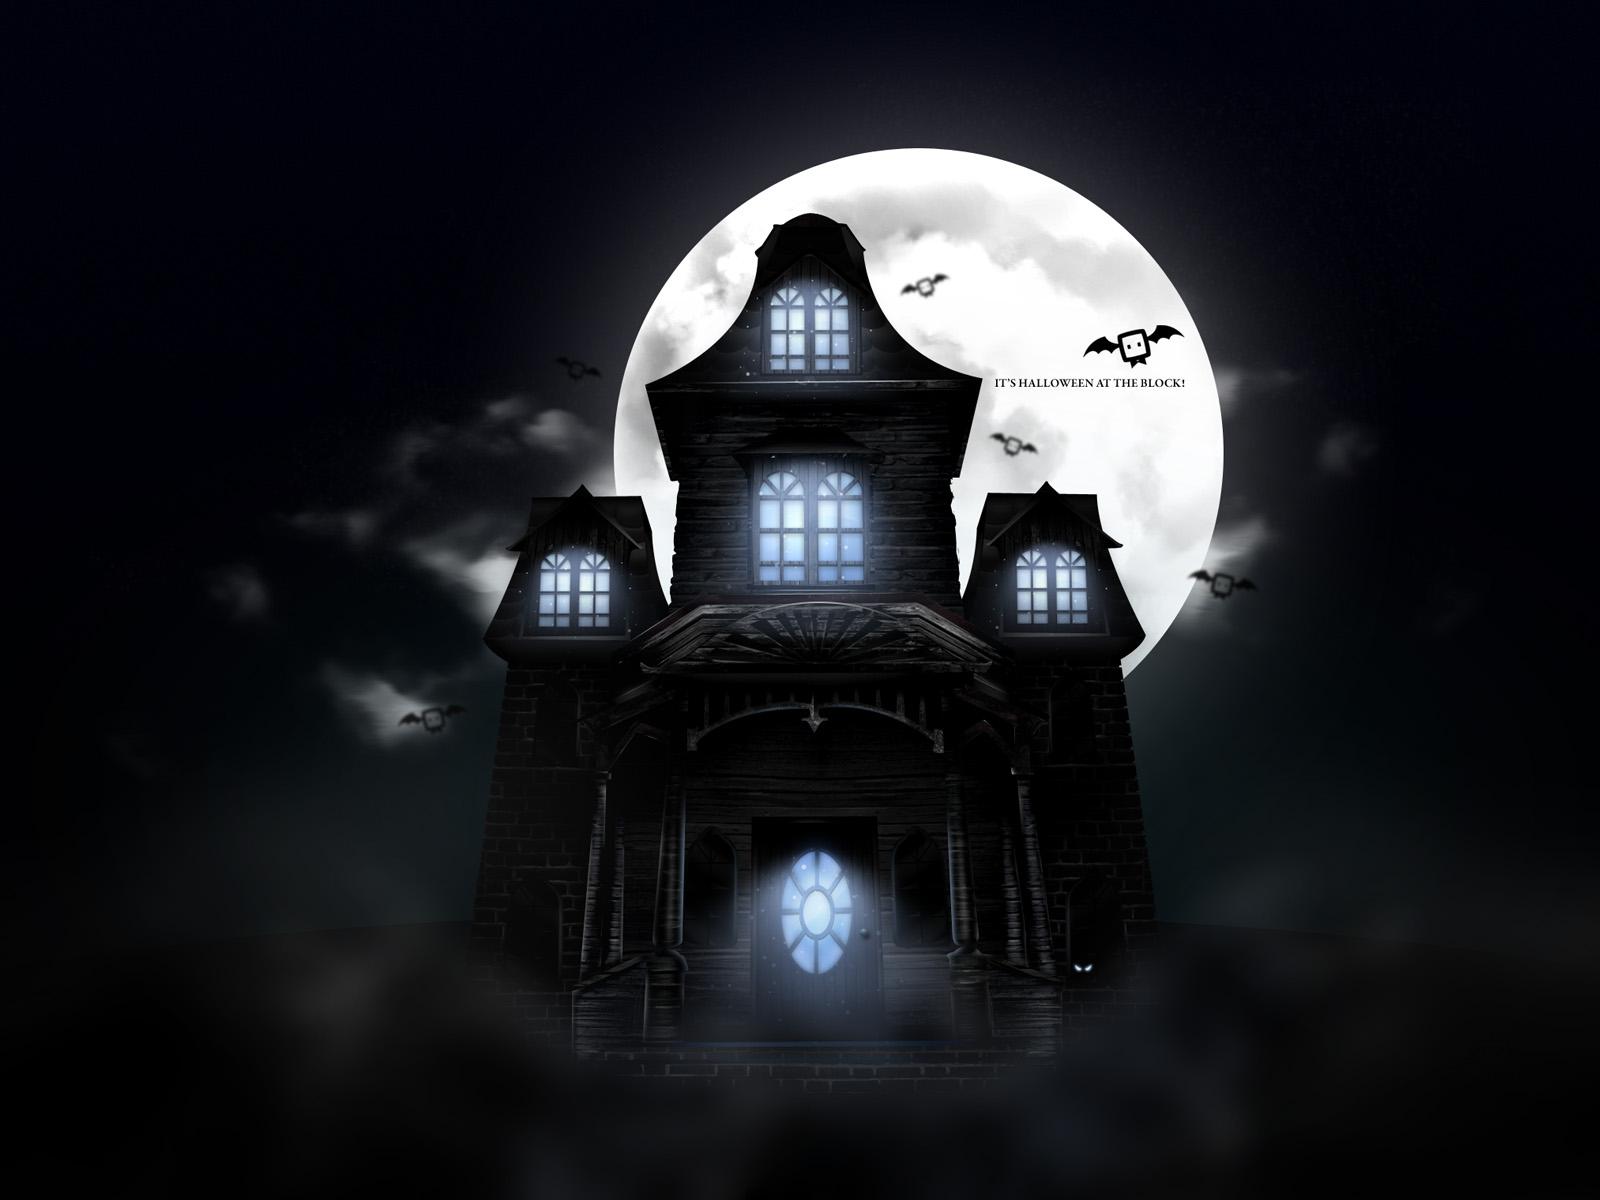 Scary Halloween 2012 Haunted House Desktop Wallpaper 1600x1200